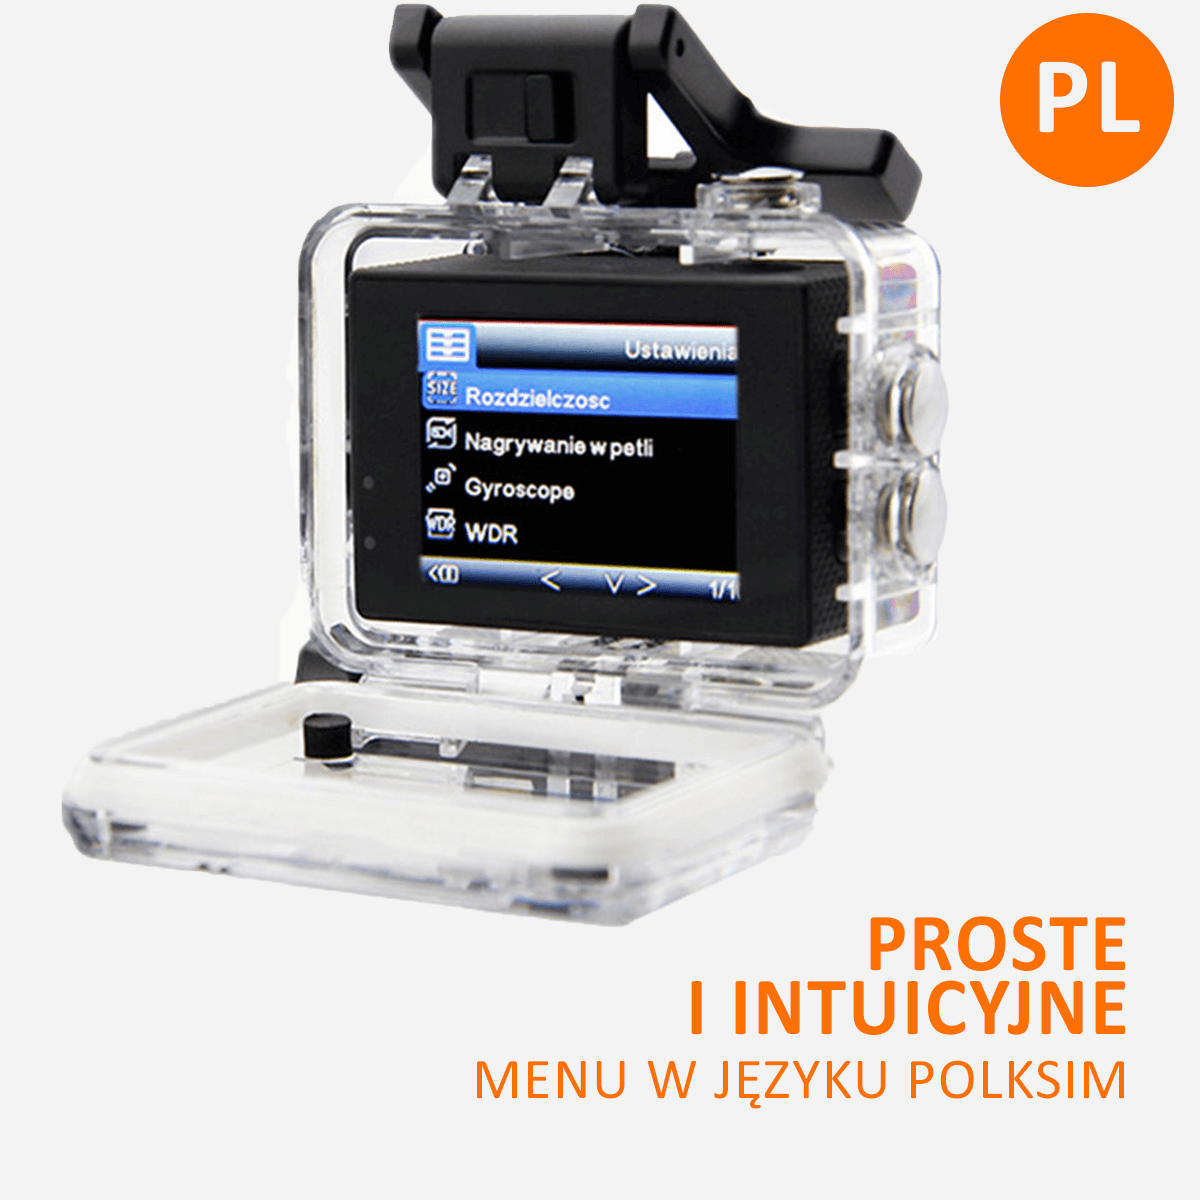 kamera-sportowa-polskie-menu-orllo-pl